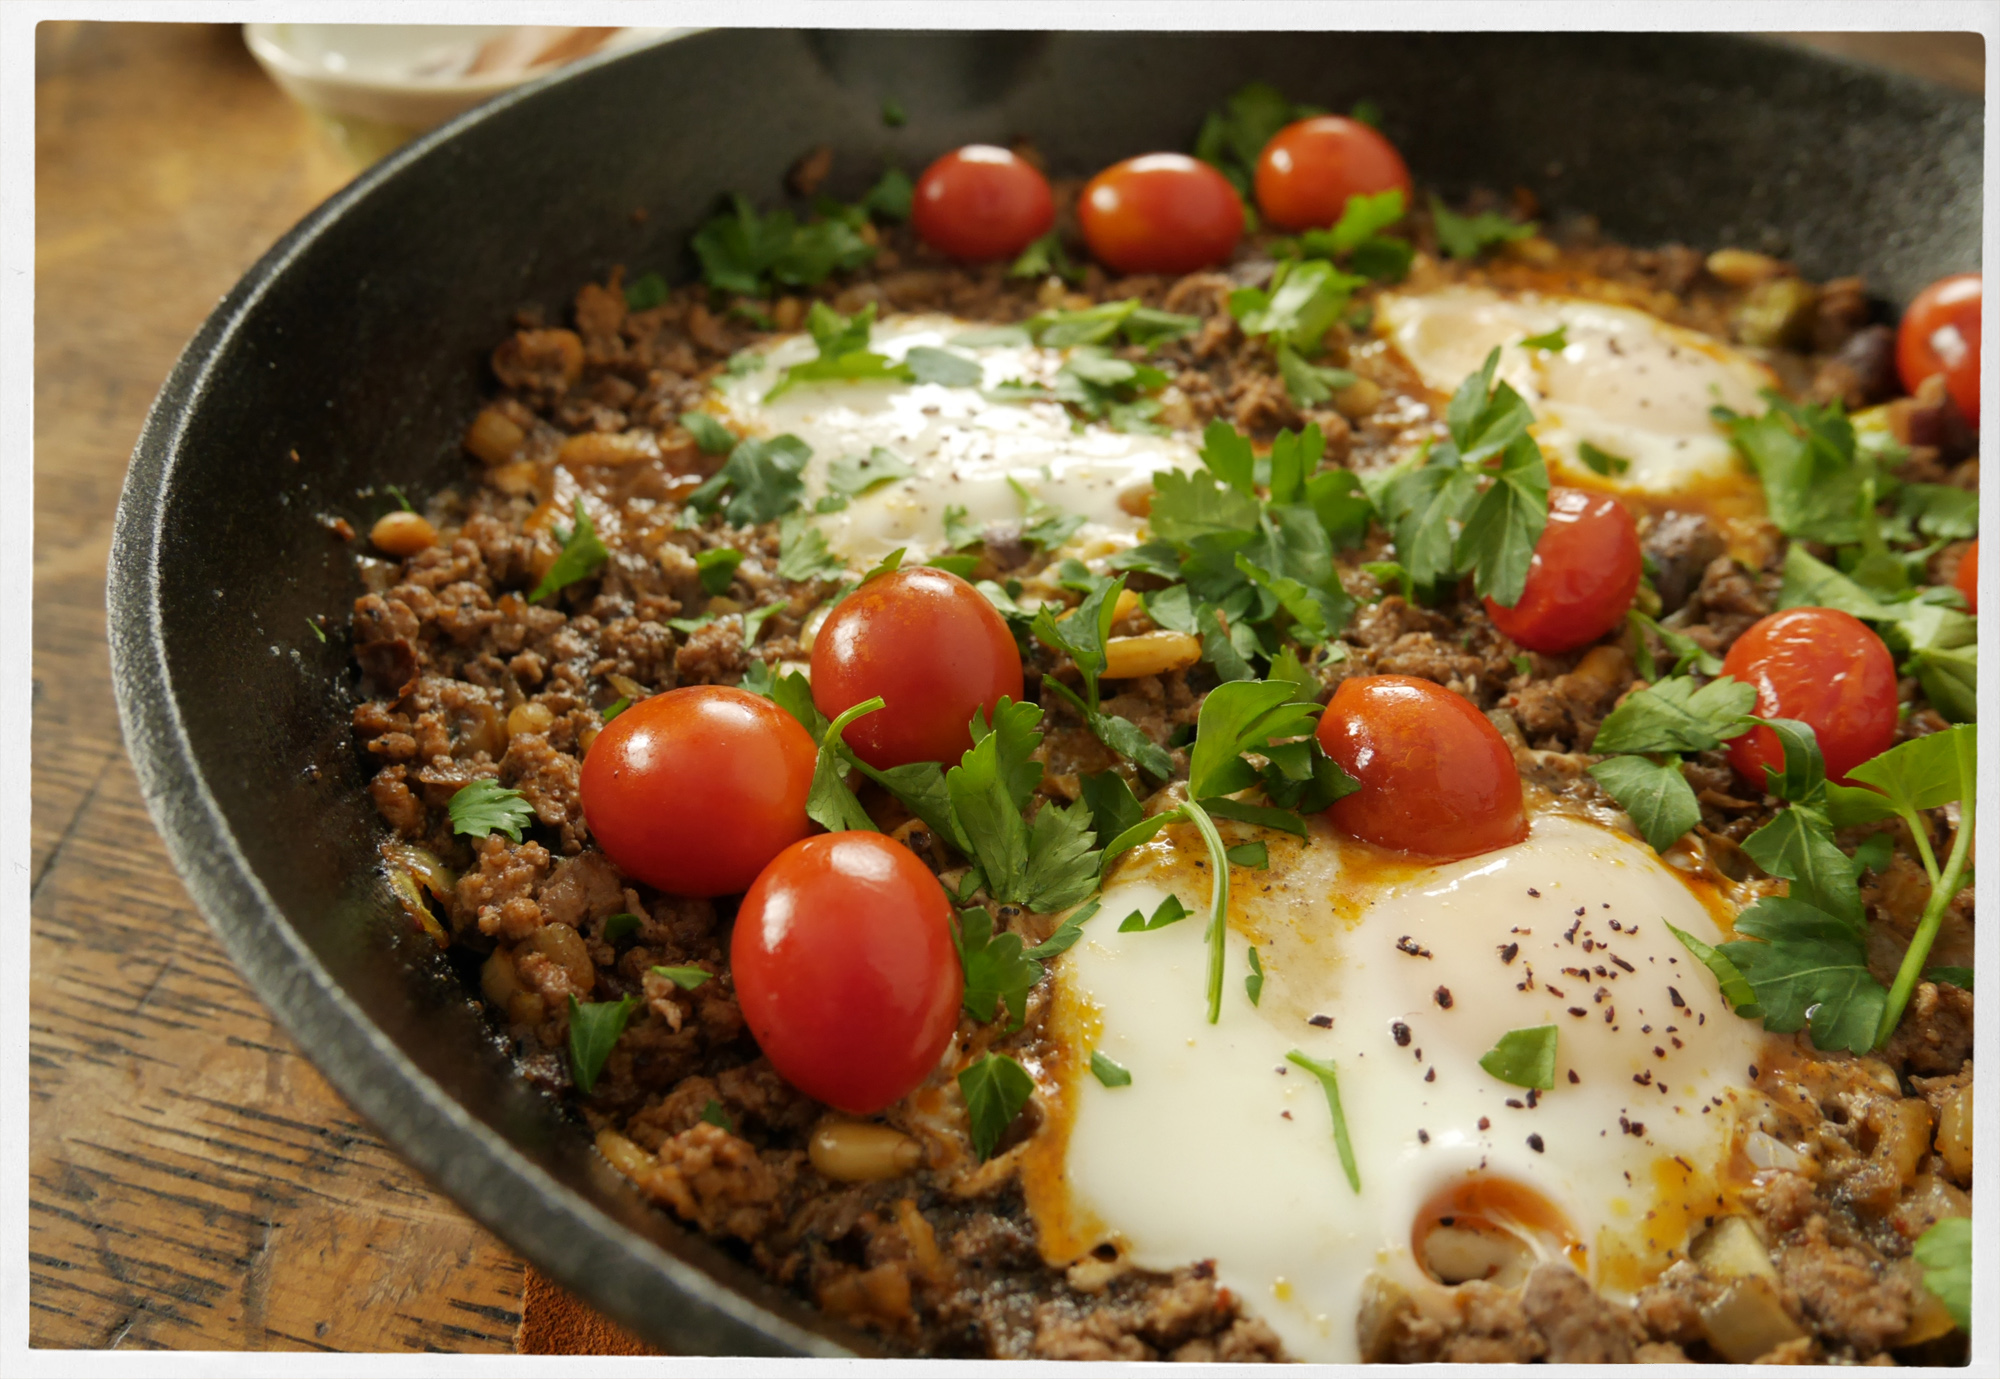 Braised eggs and lamb.